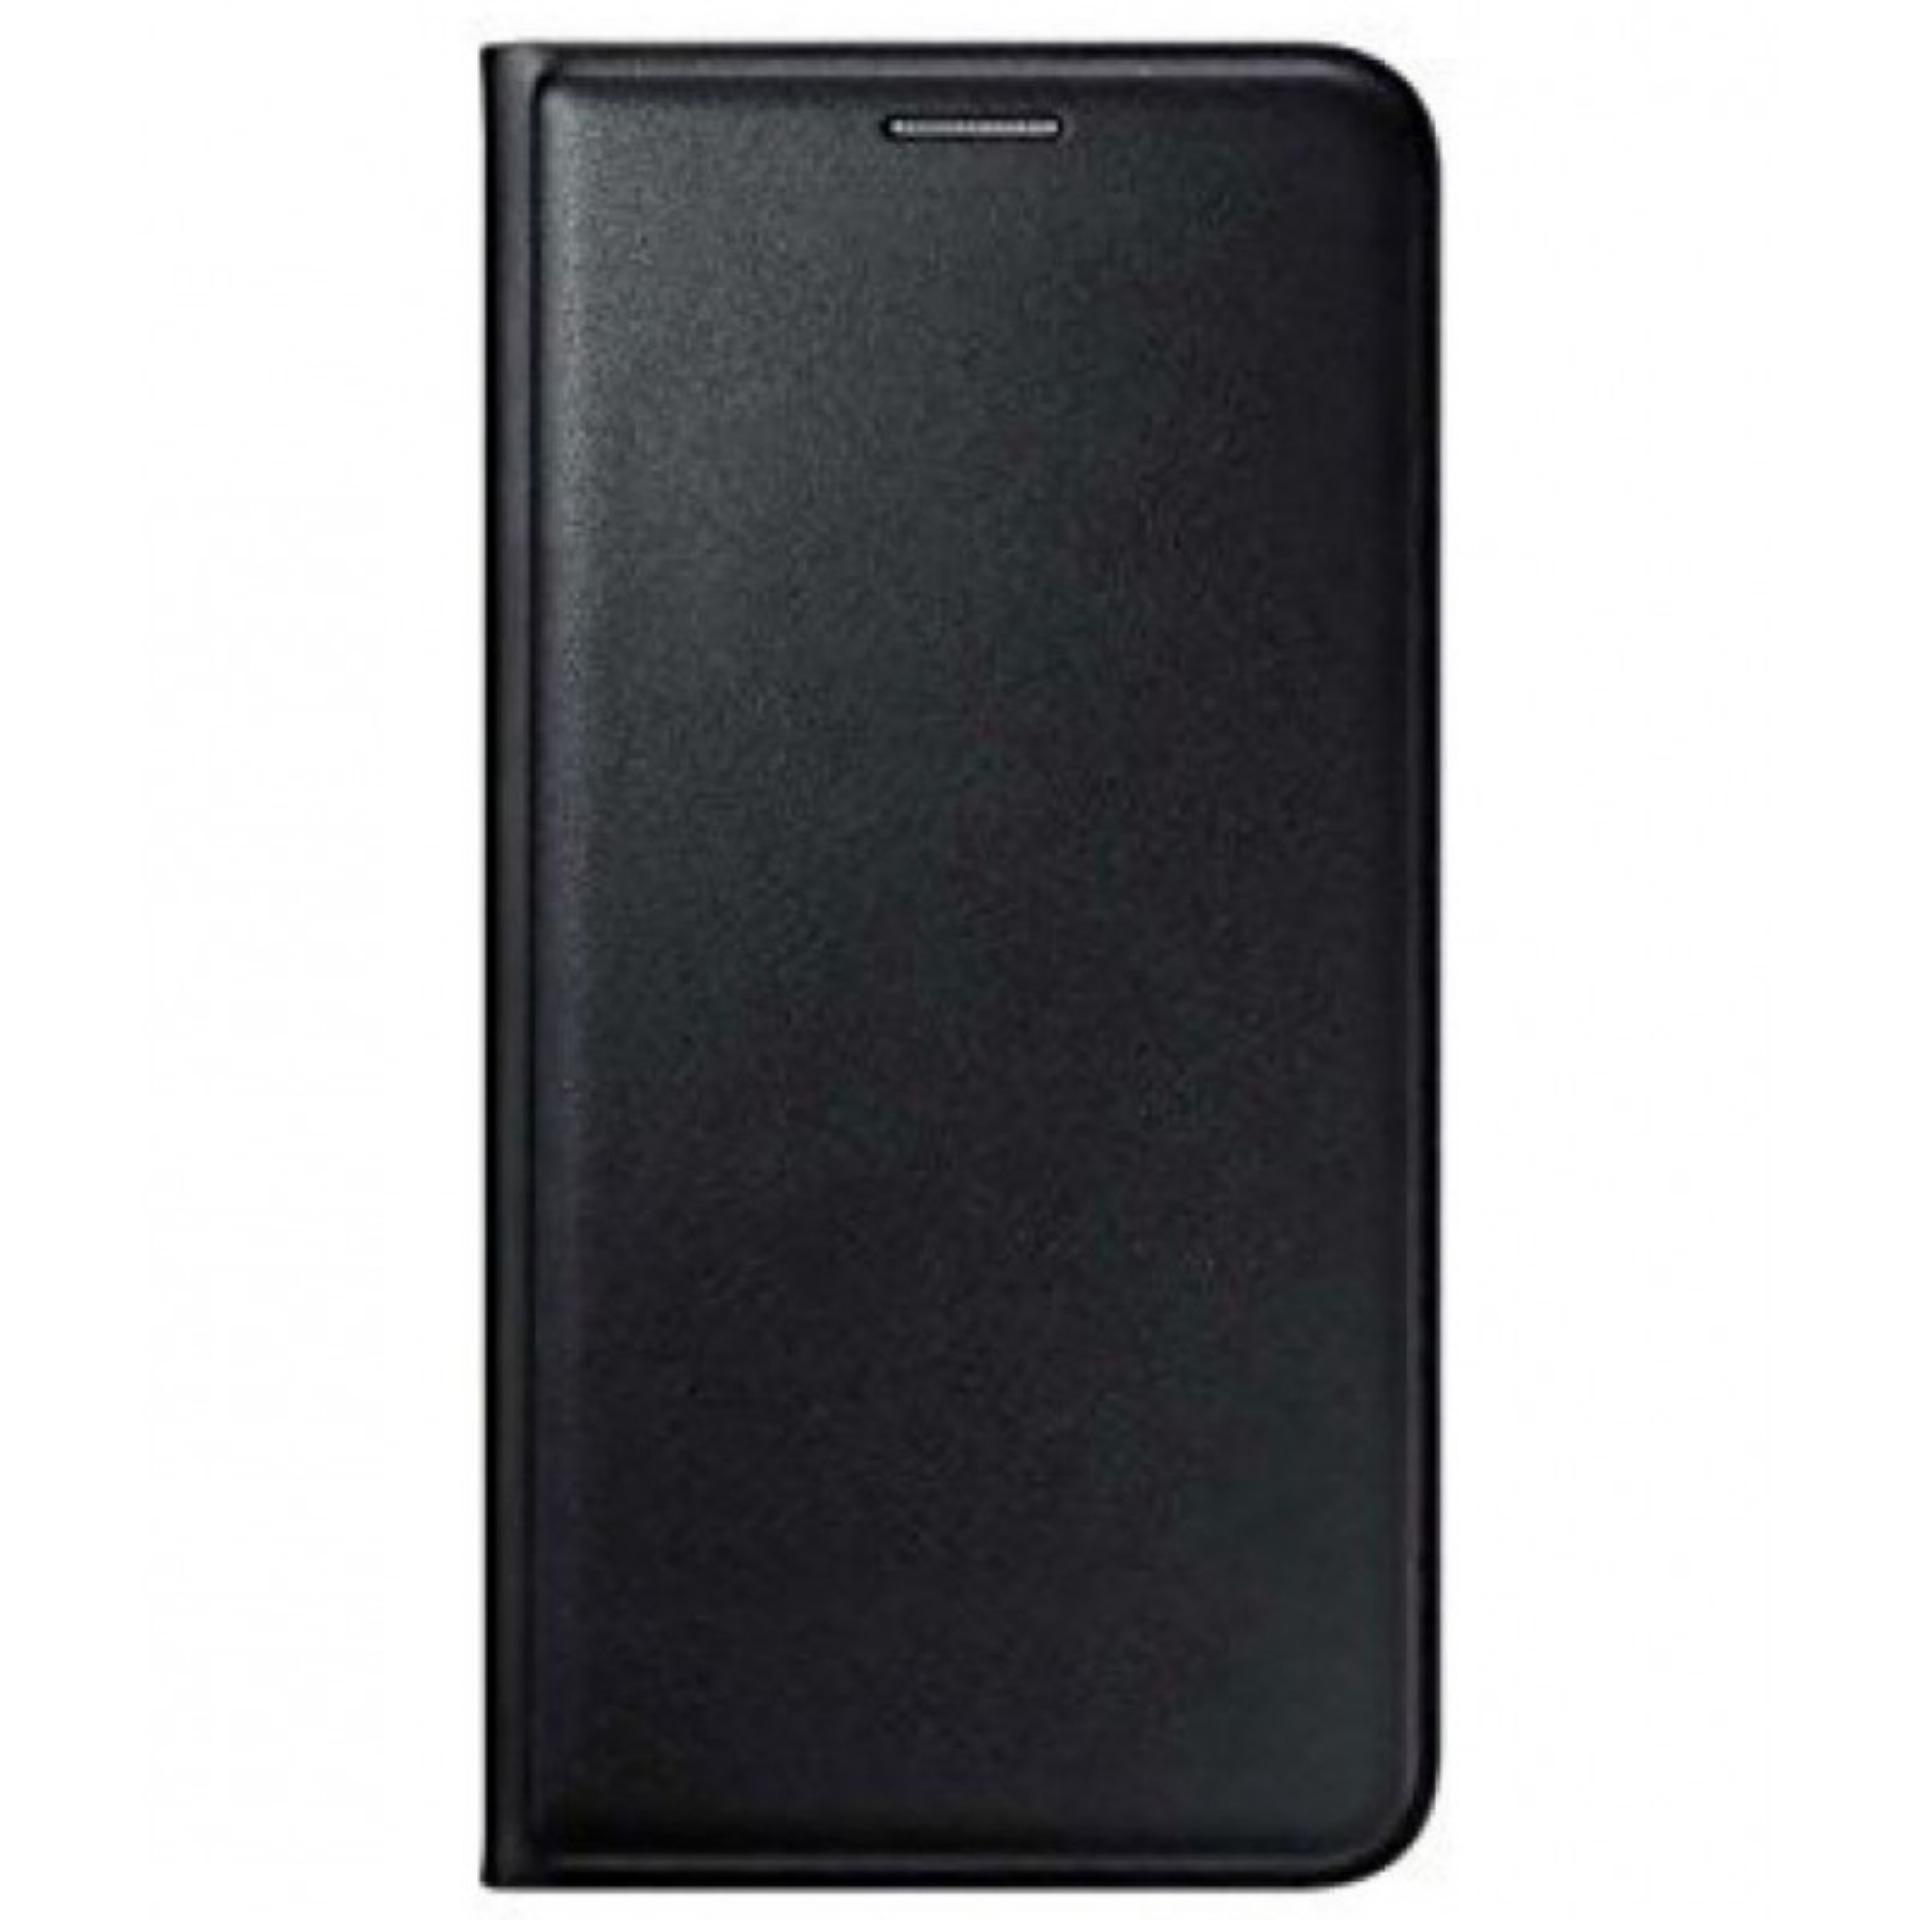 Flip Cover for Lenovo A7700 - Black